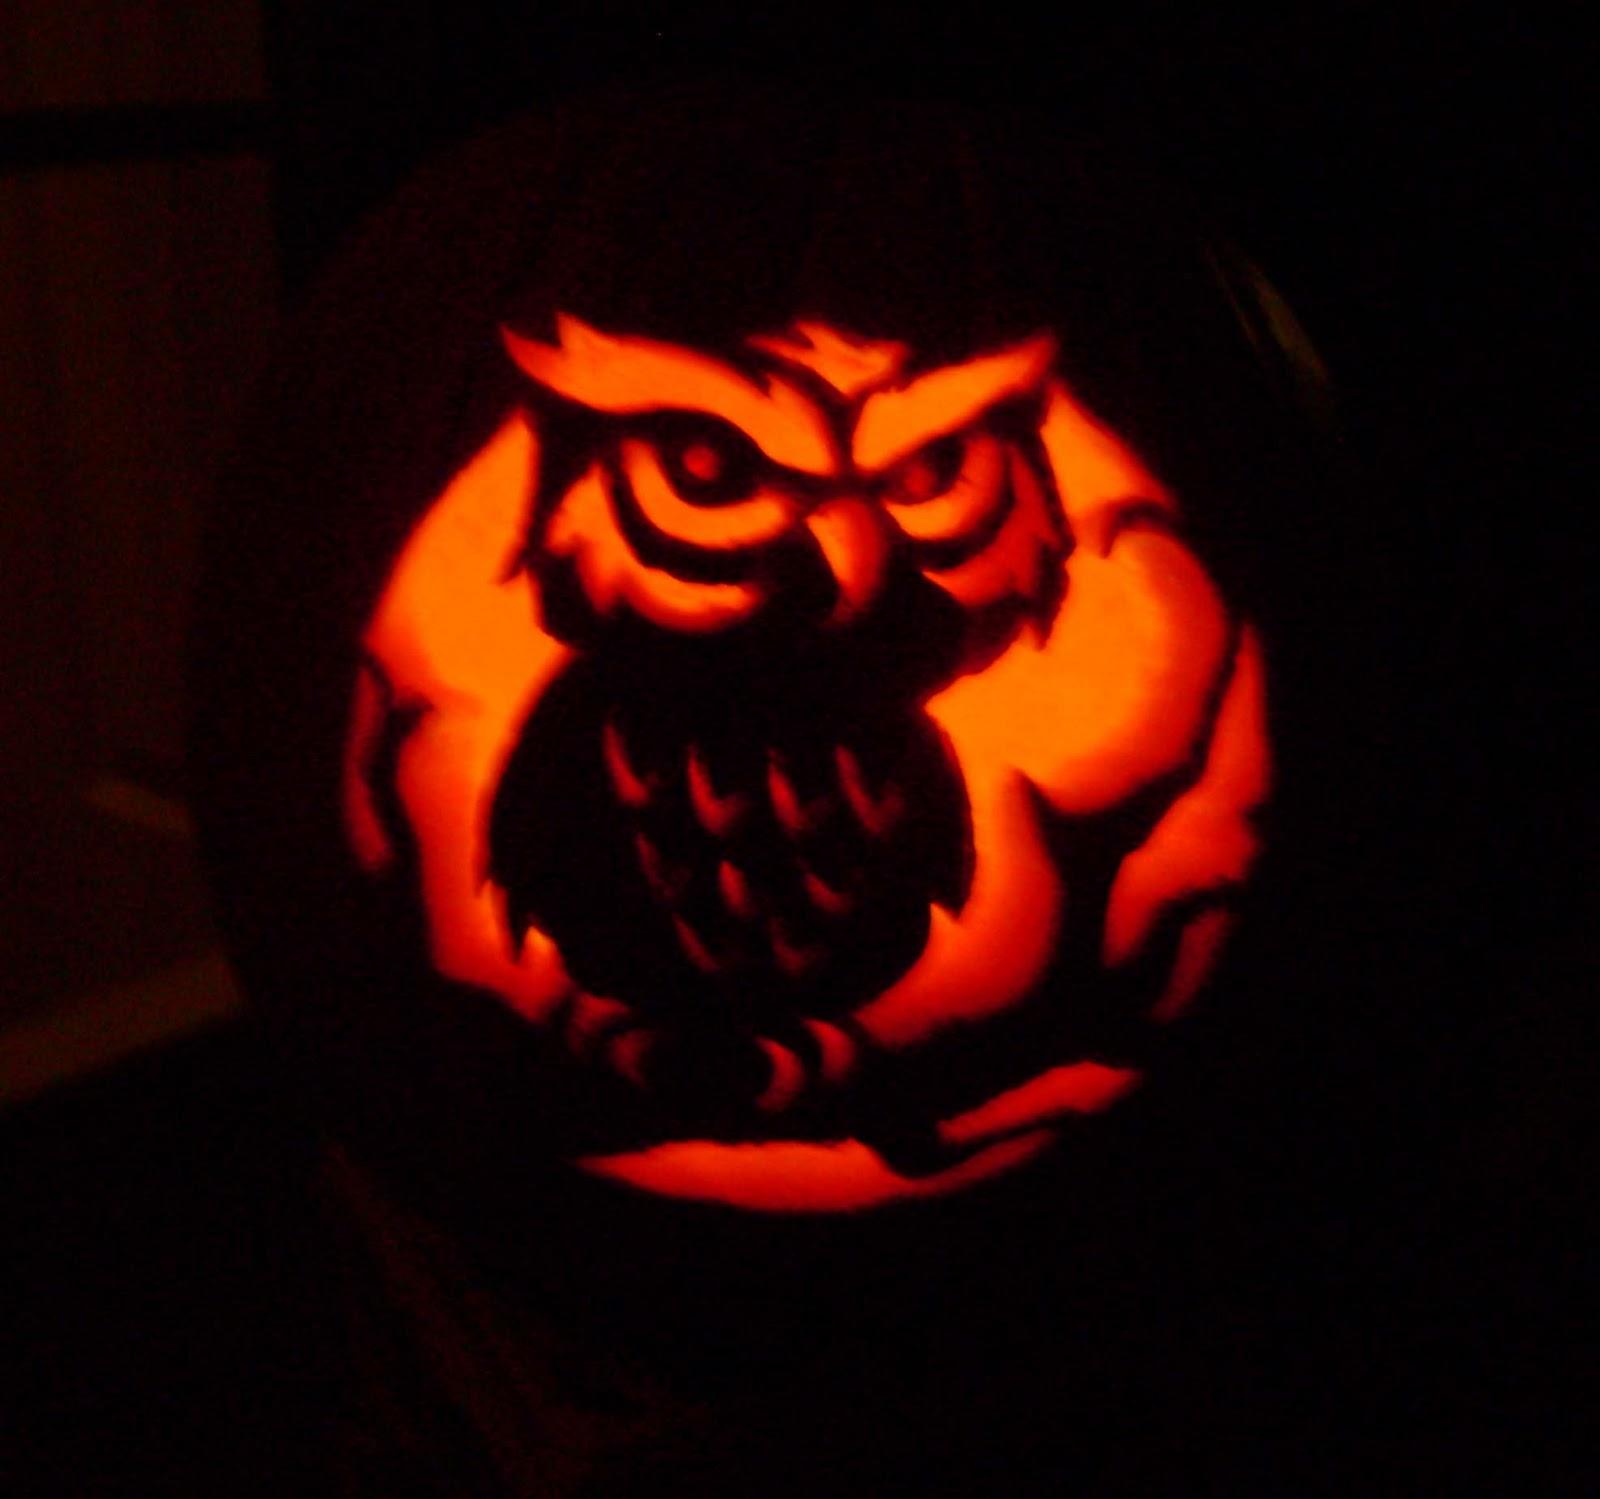 Blessed Samhein Happy Halloween Y Feliz Dia De Los Muertos This Years Pumpkin Design Template